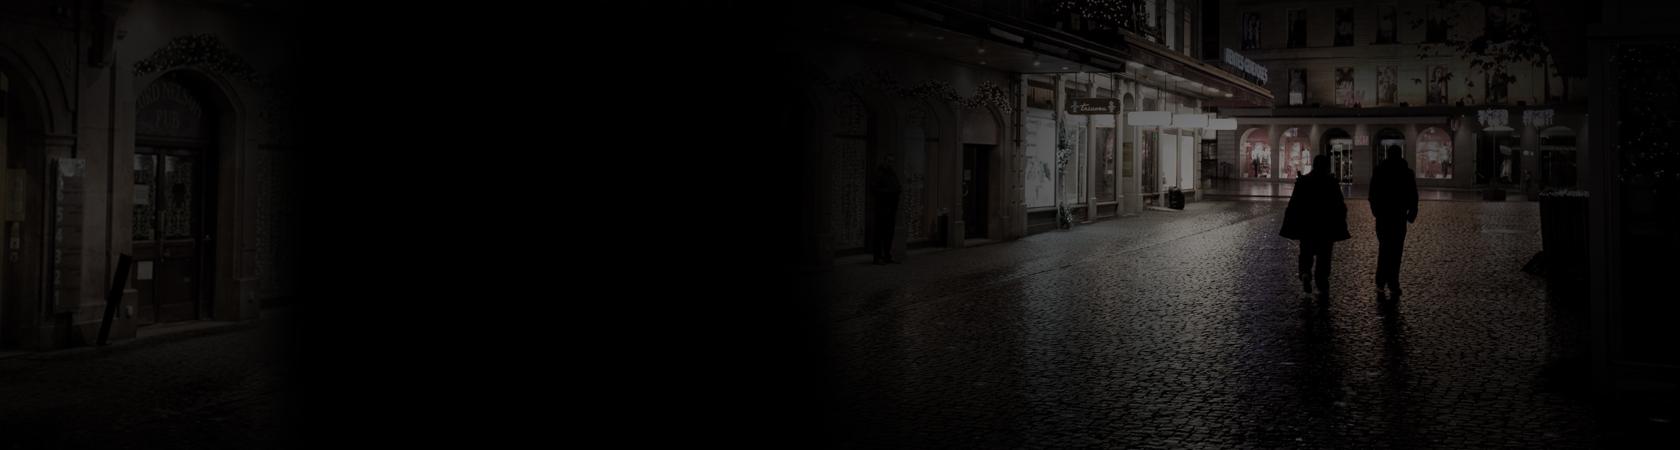 Produktfotografie-Berlin